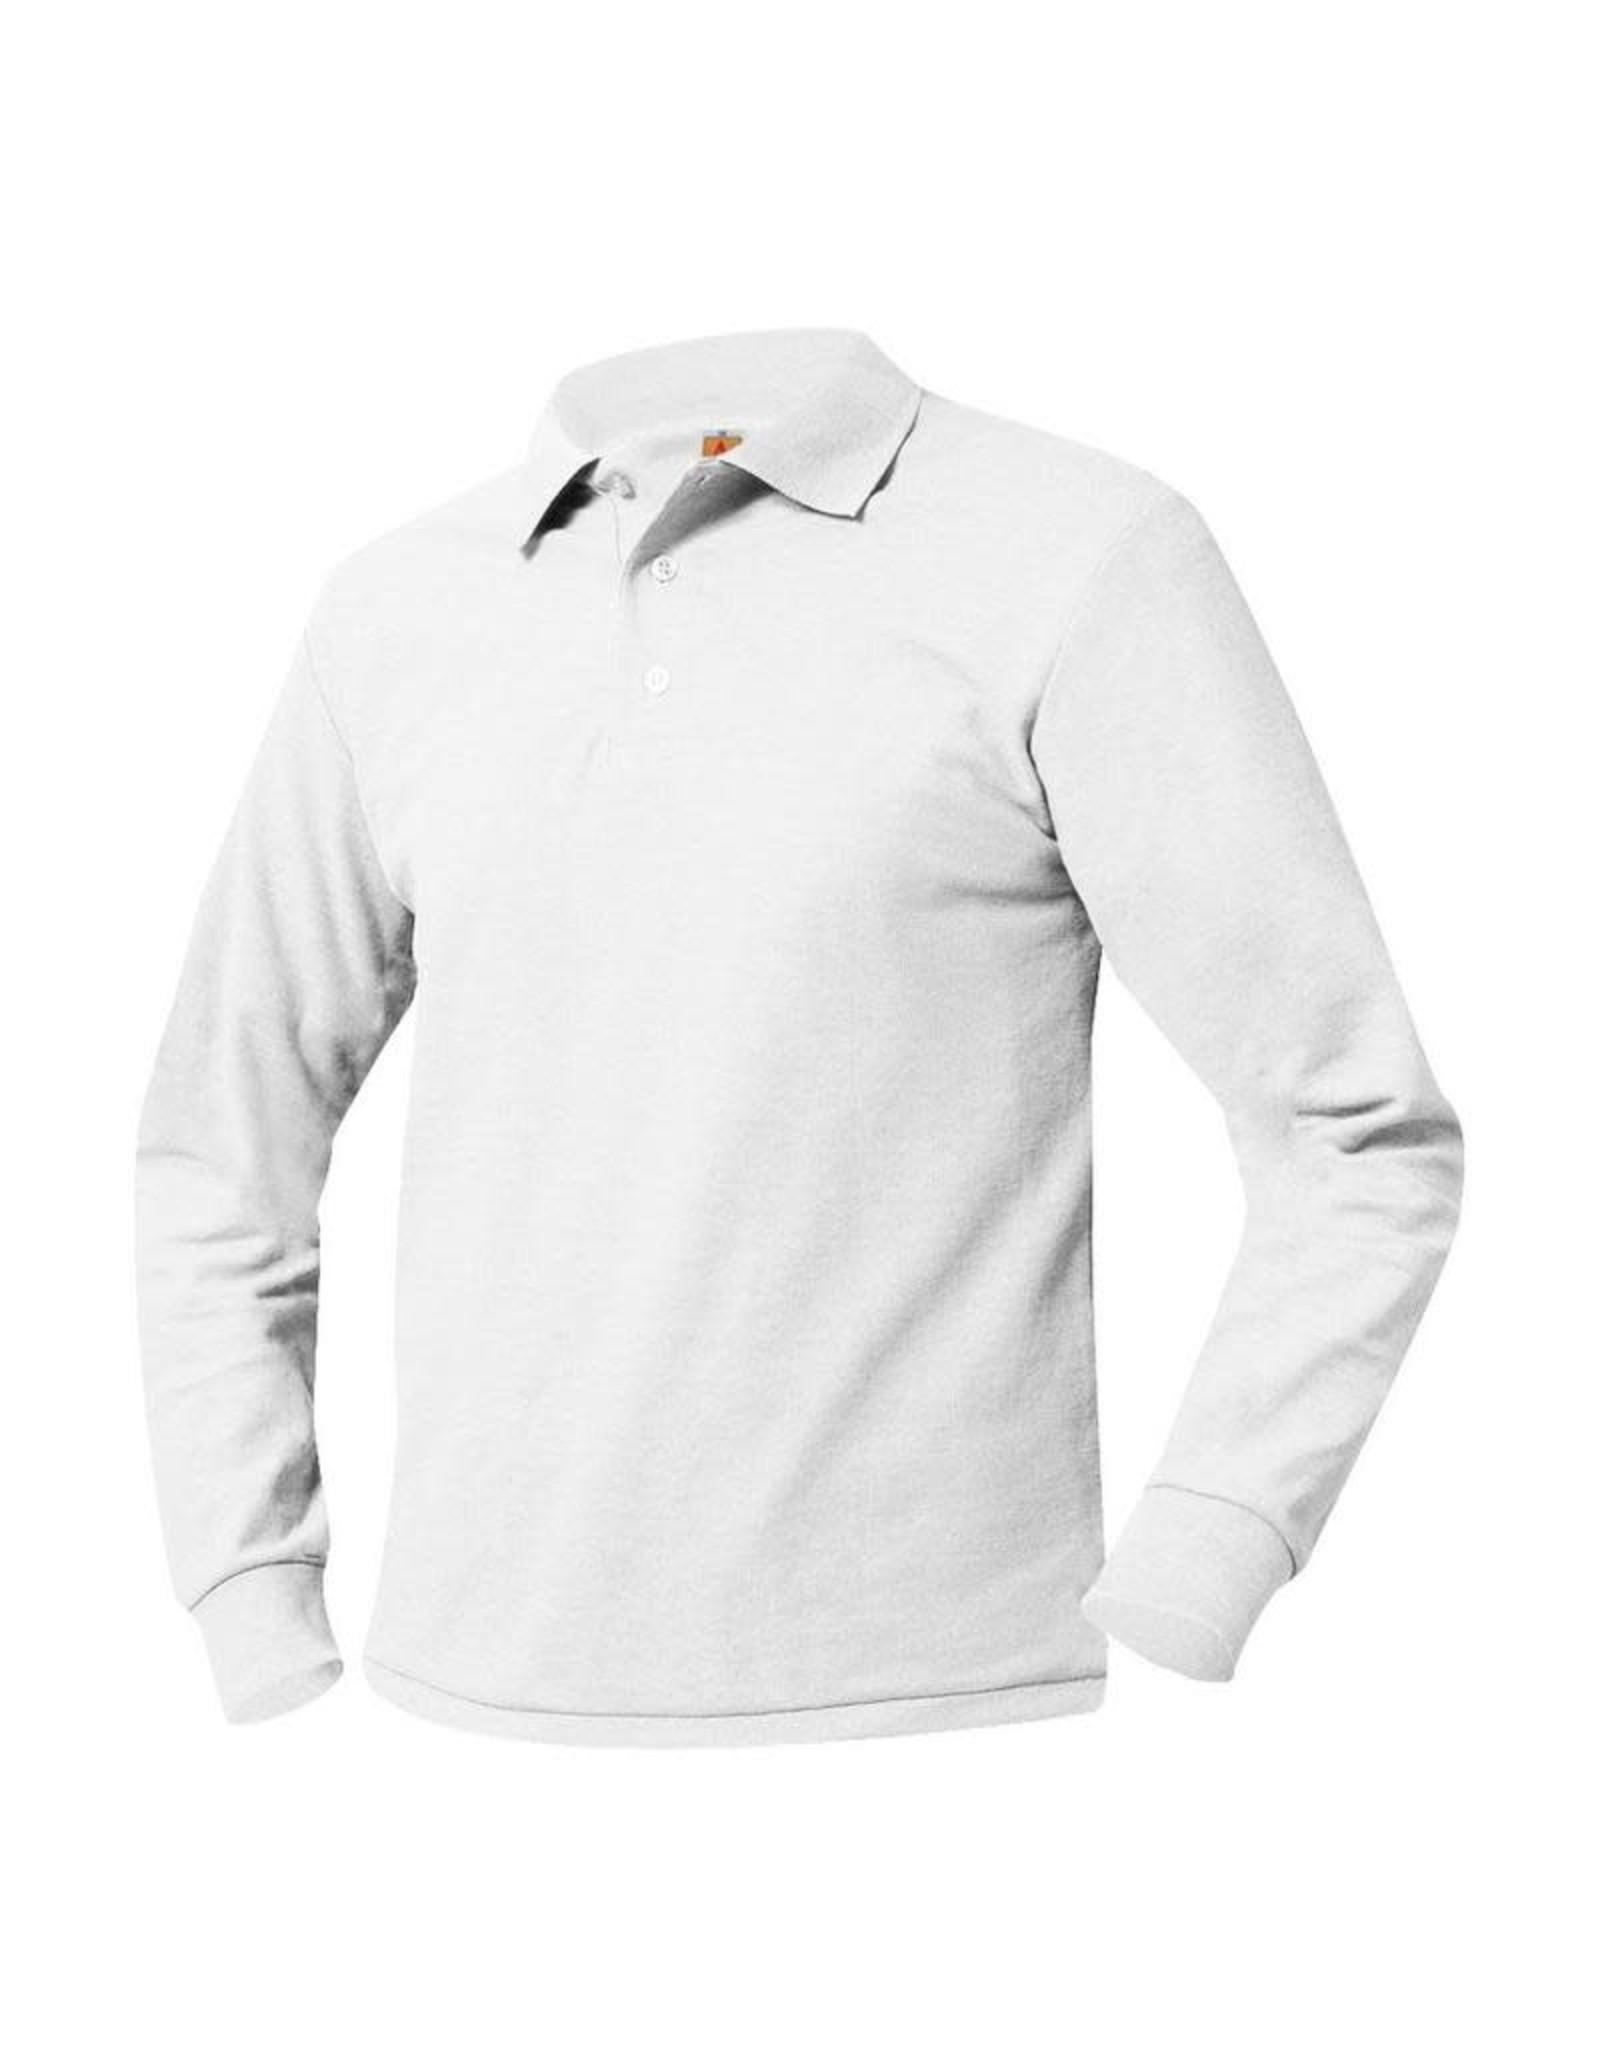 UNIFORM Unisex Polo Long Sleeve Shirt. SJBES, SJBMS, & SV schools